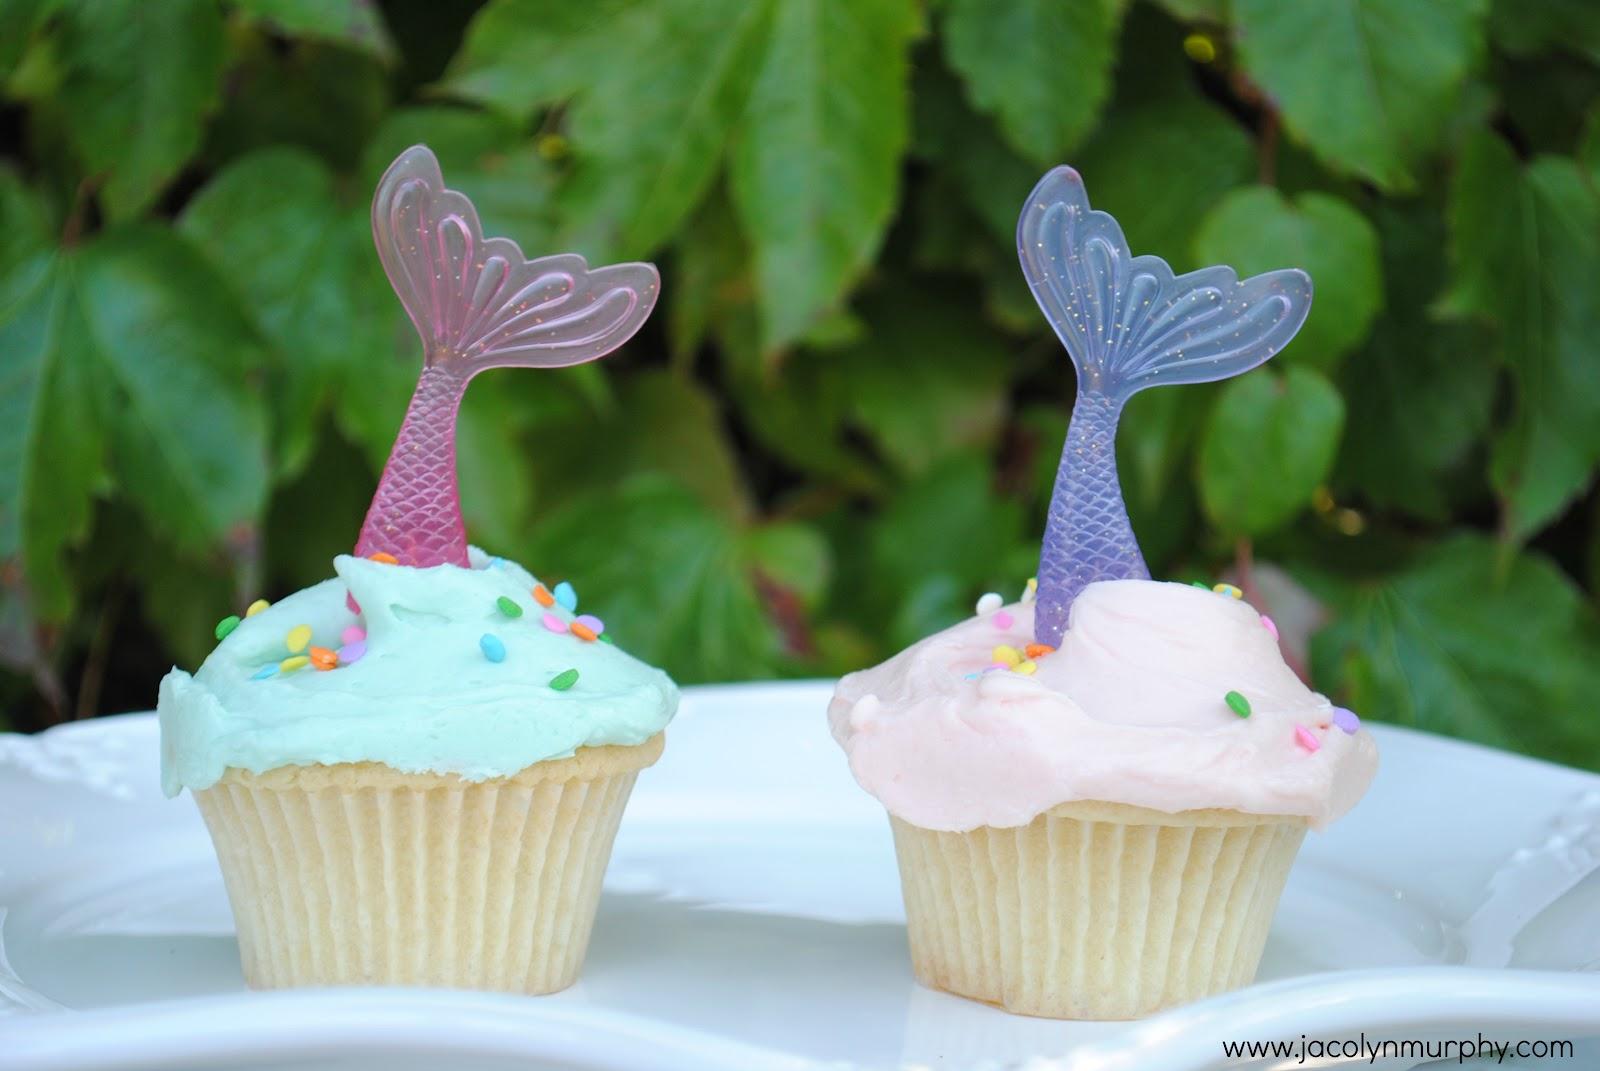 Jac o' lyn Murphy: Dive In! Mermaid Cupcake Toppers